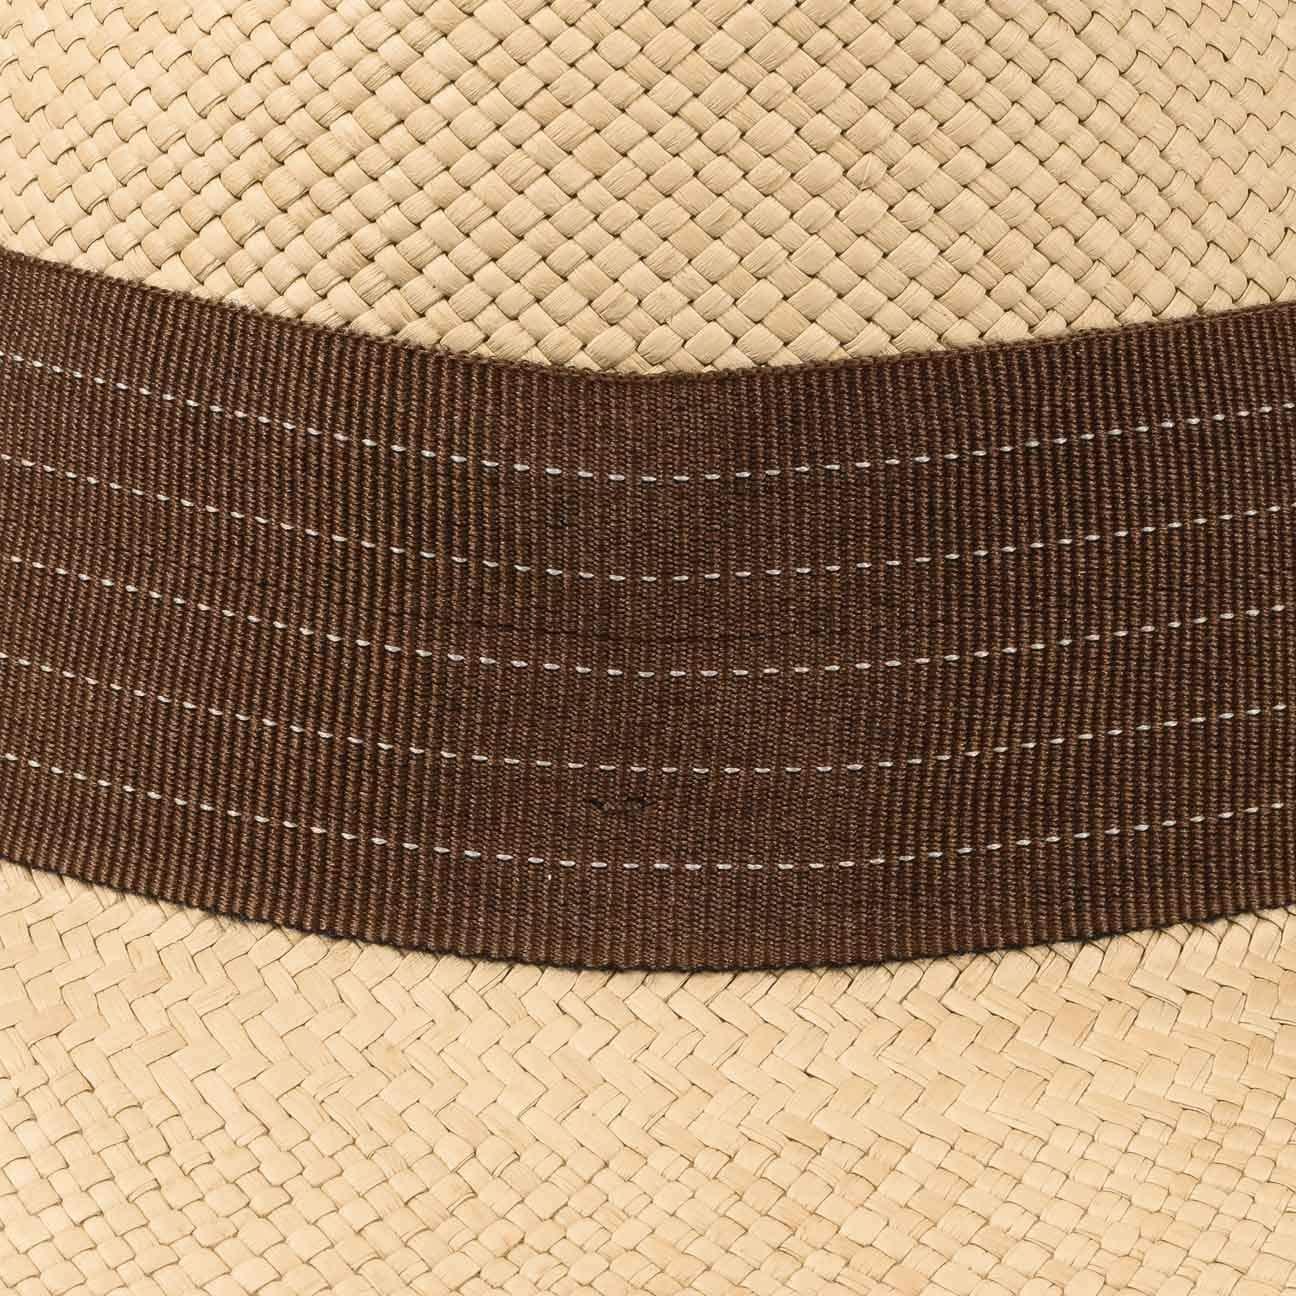 Lierys Cappello Panama Brown Rockfall by Uomo Made in Ecuador Estivo Paglia da Sole con Nastro Grosgrain Primavera//Estate